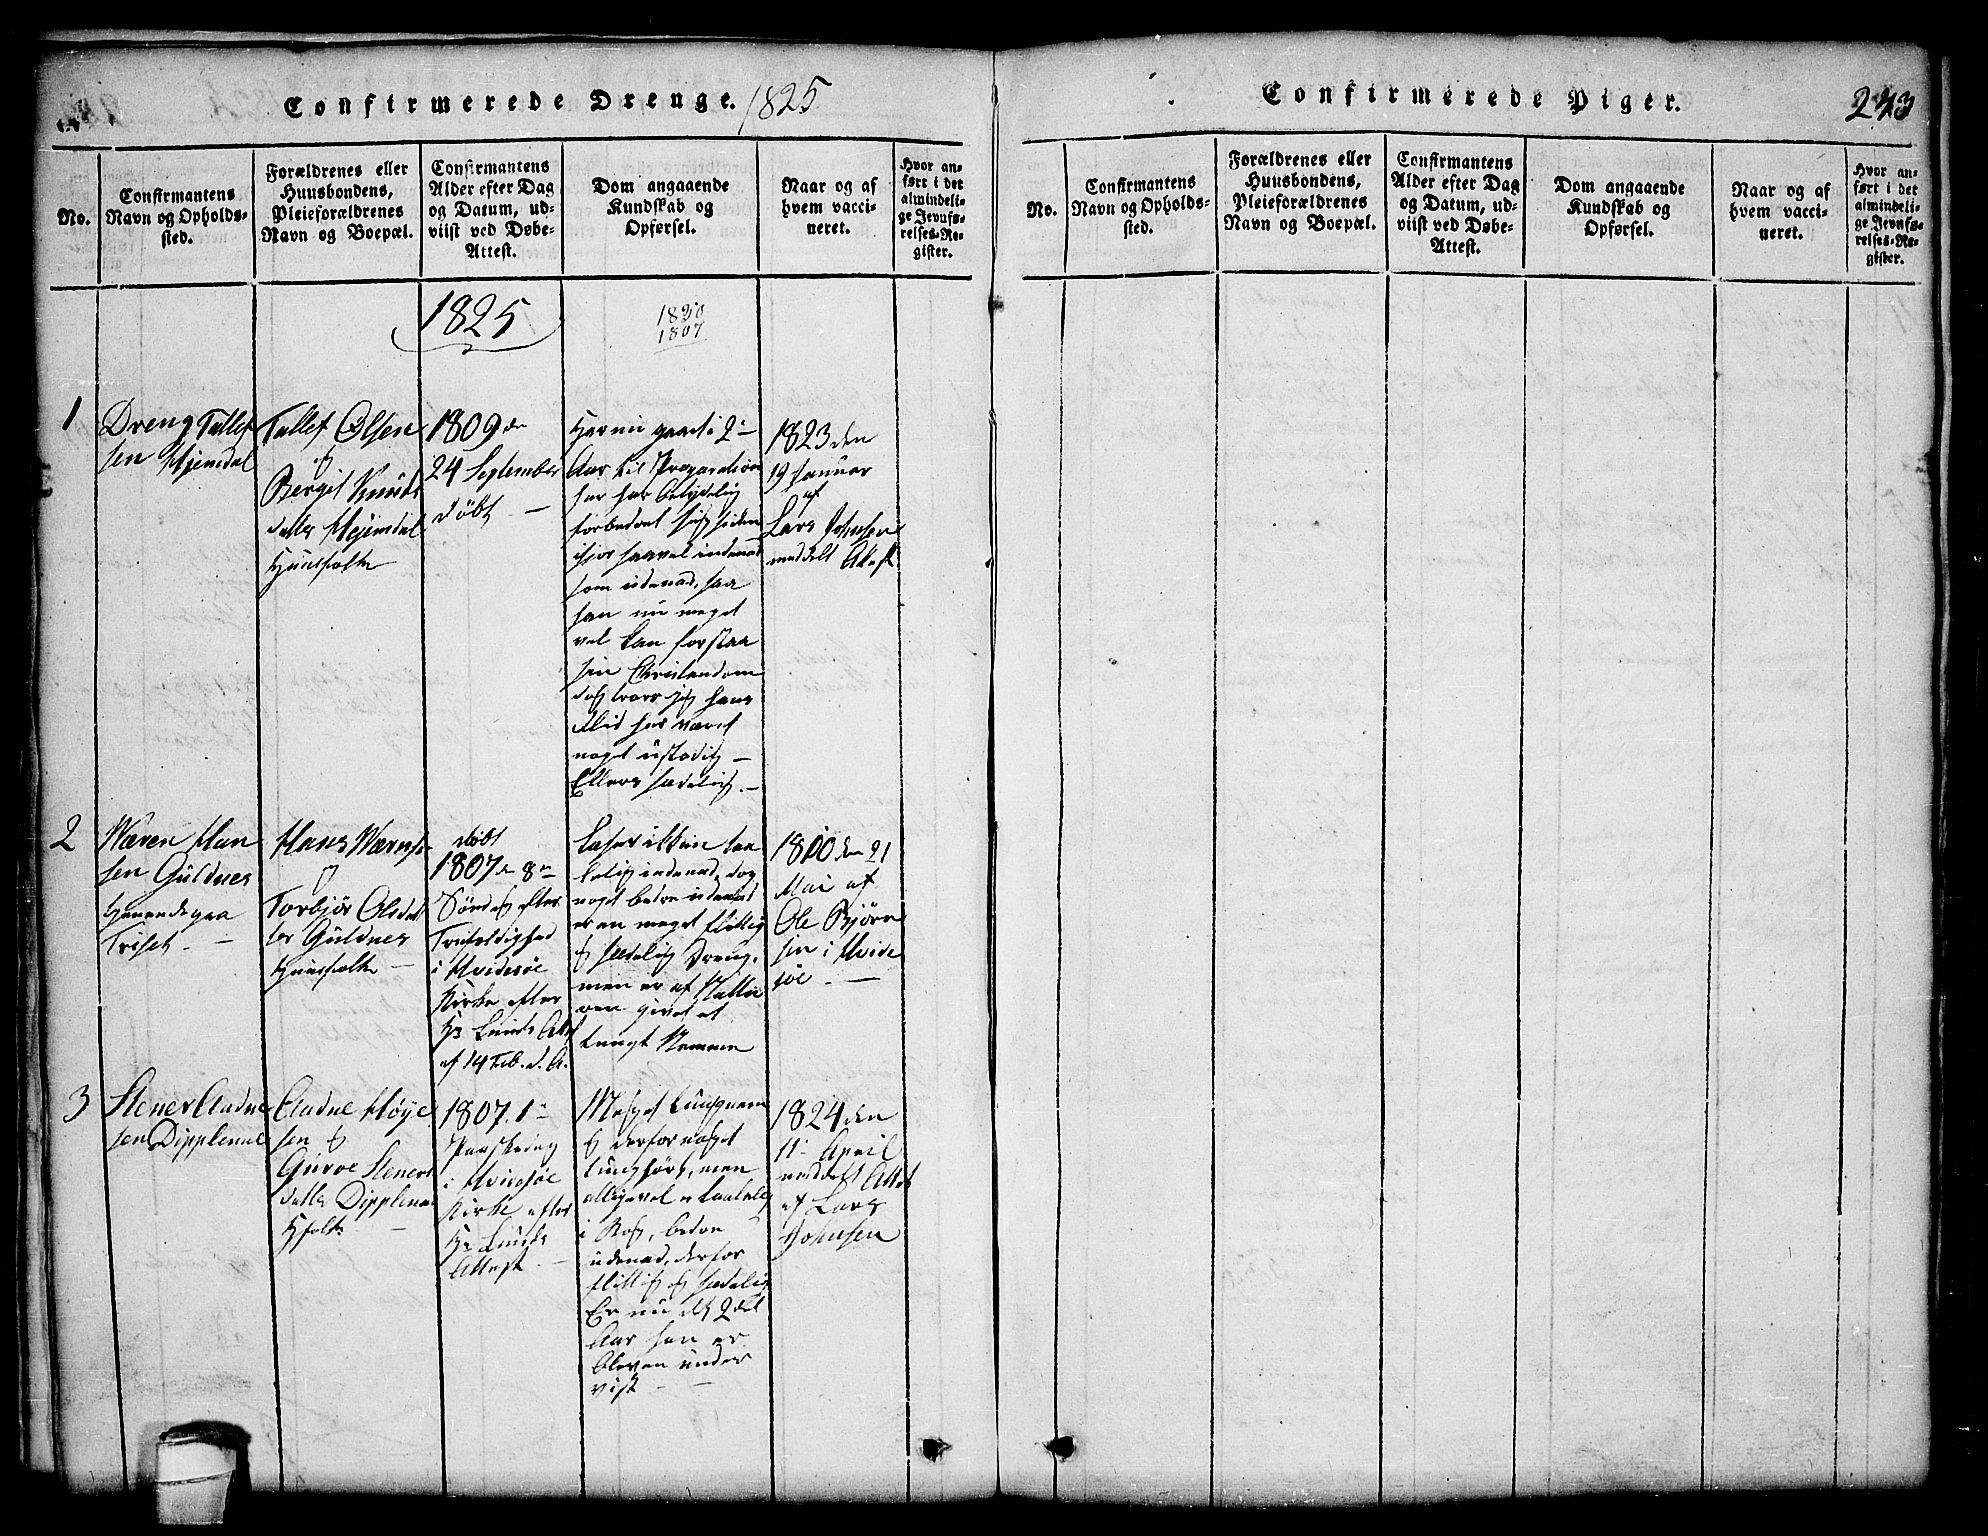 SAKO, Lårdal kirkebøker, G/Ga/L0001: Klokkerbok nr. I 1, 1815-1861, s. 243